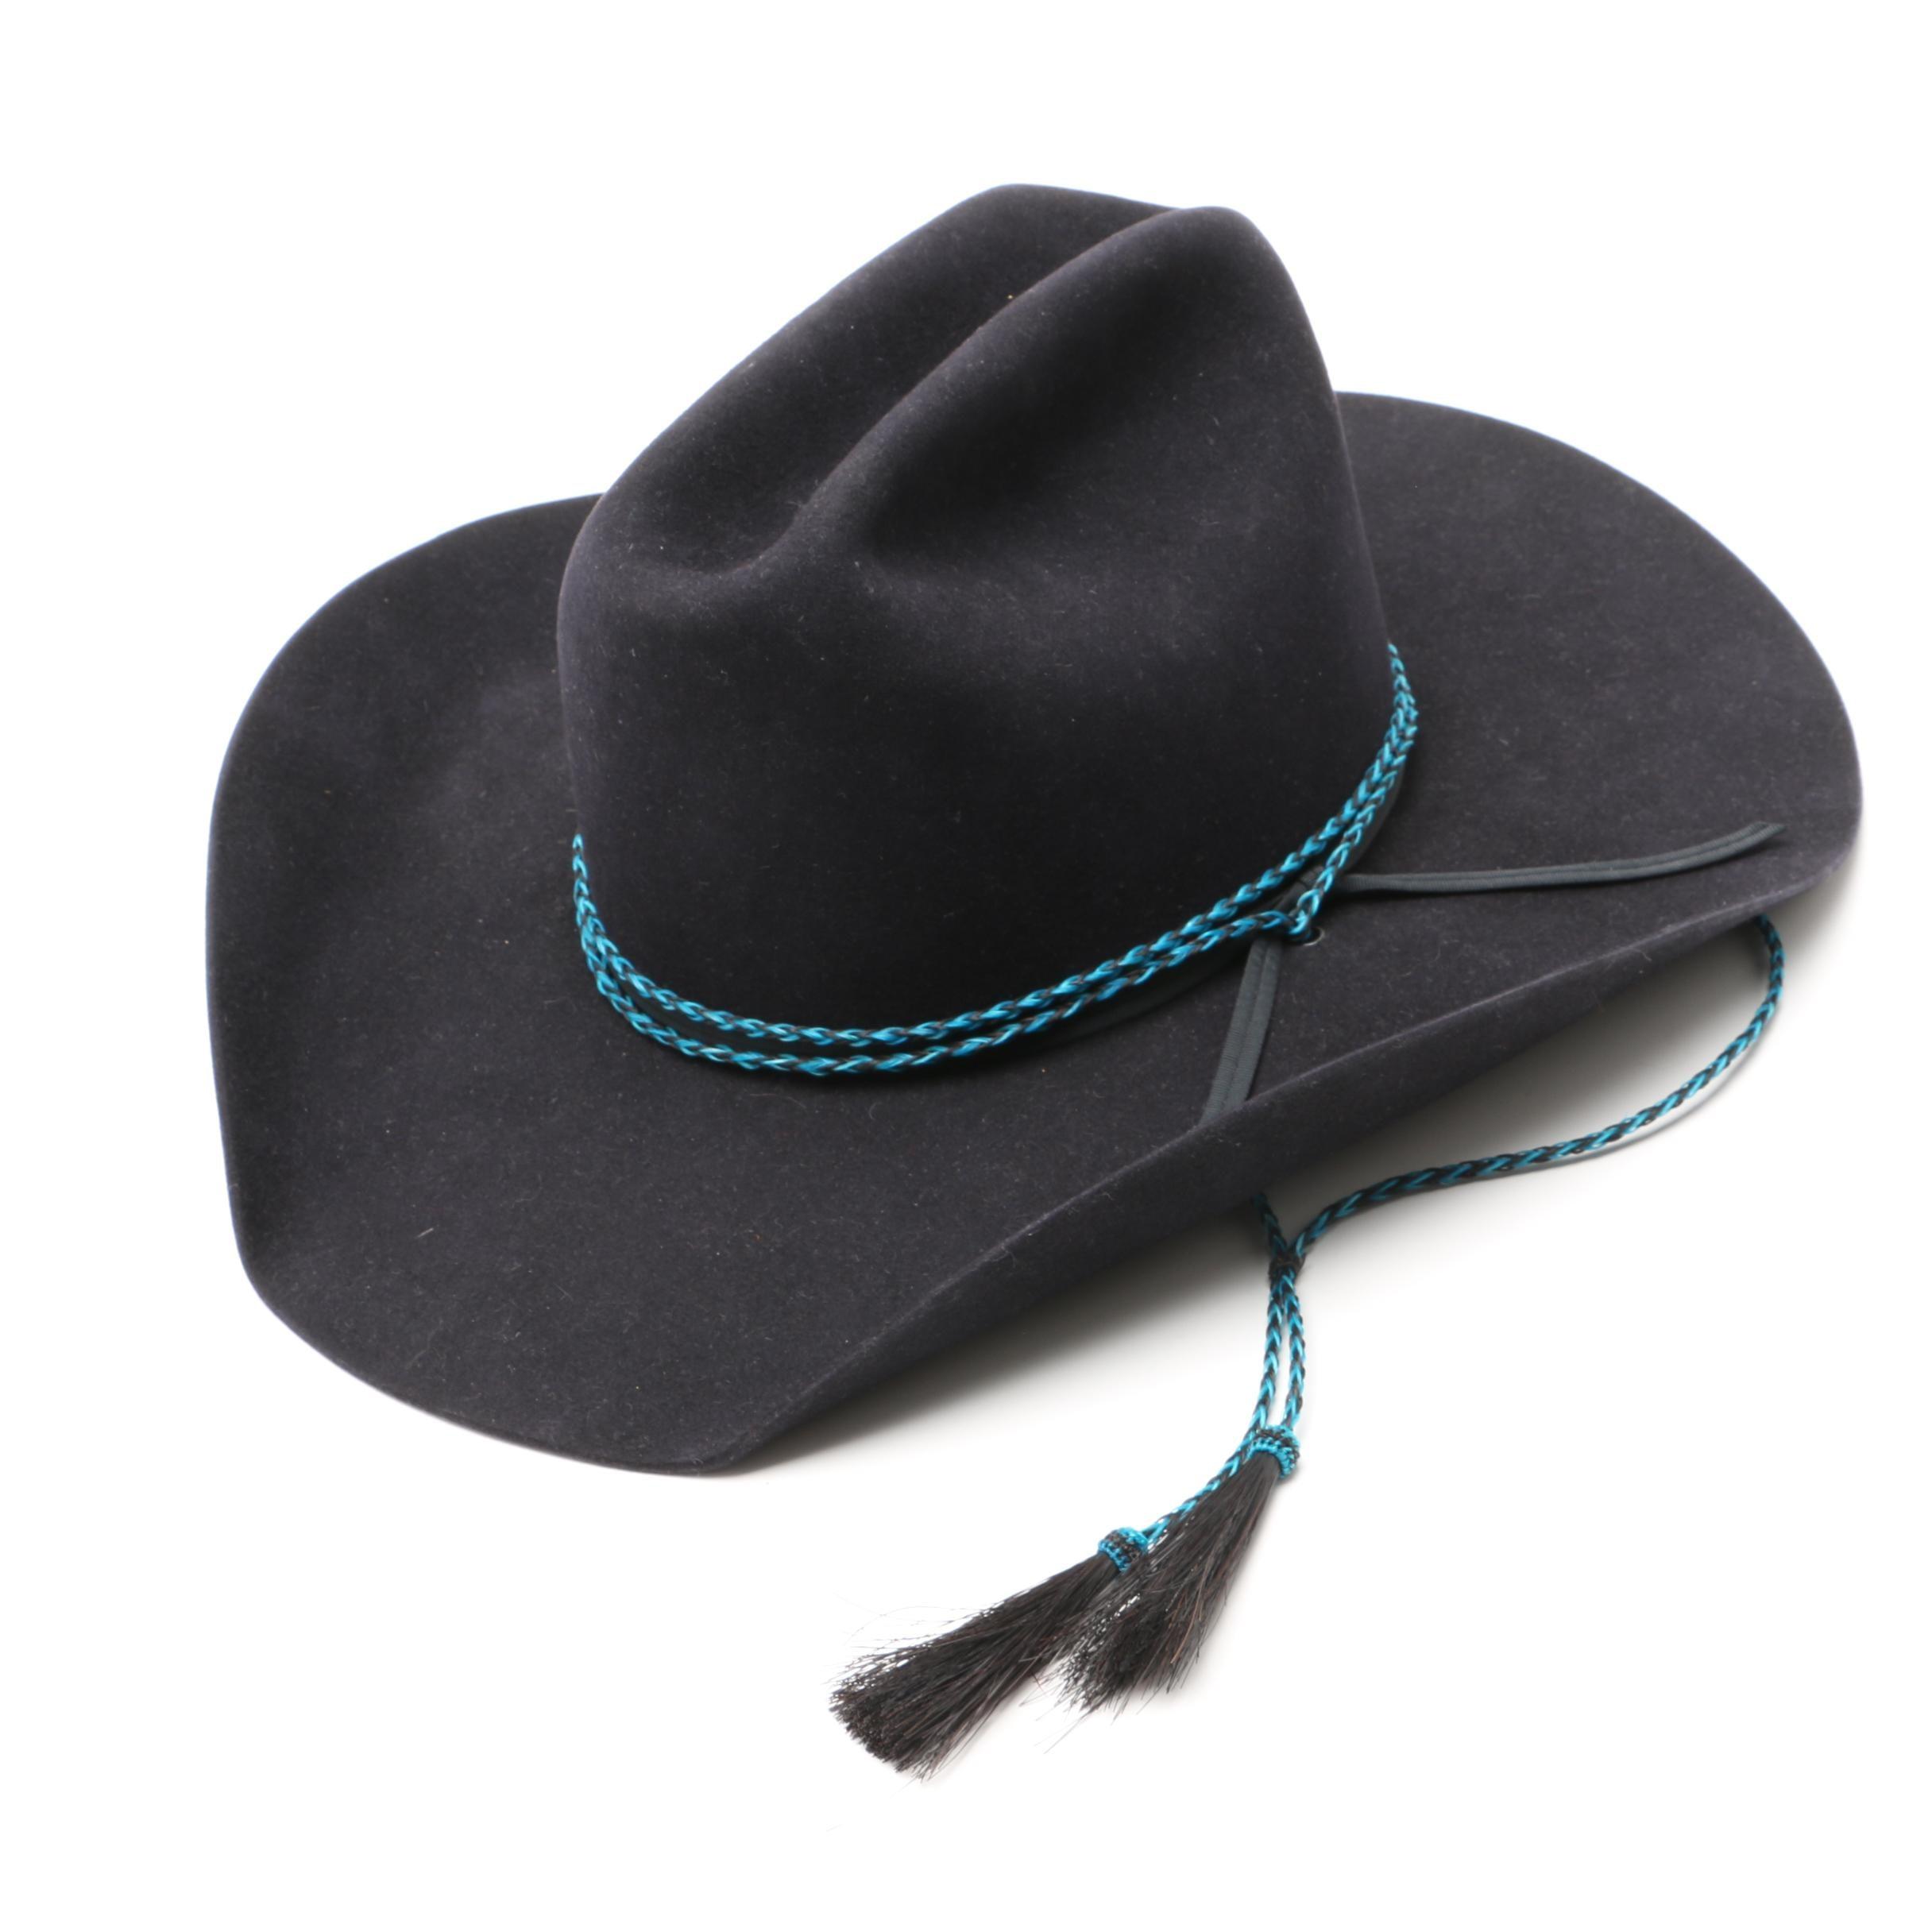 Custom Made 10X Beaver Felt Cowgirl Hat from Star of the West, South Dakota